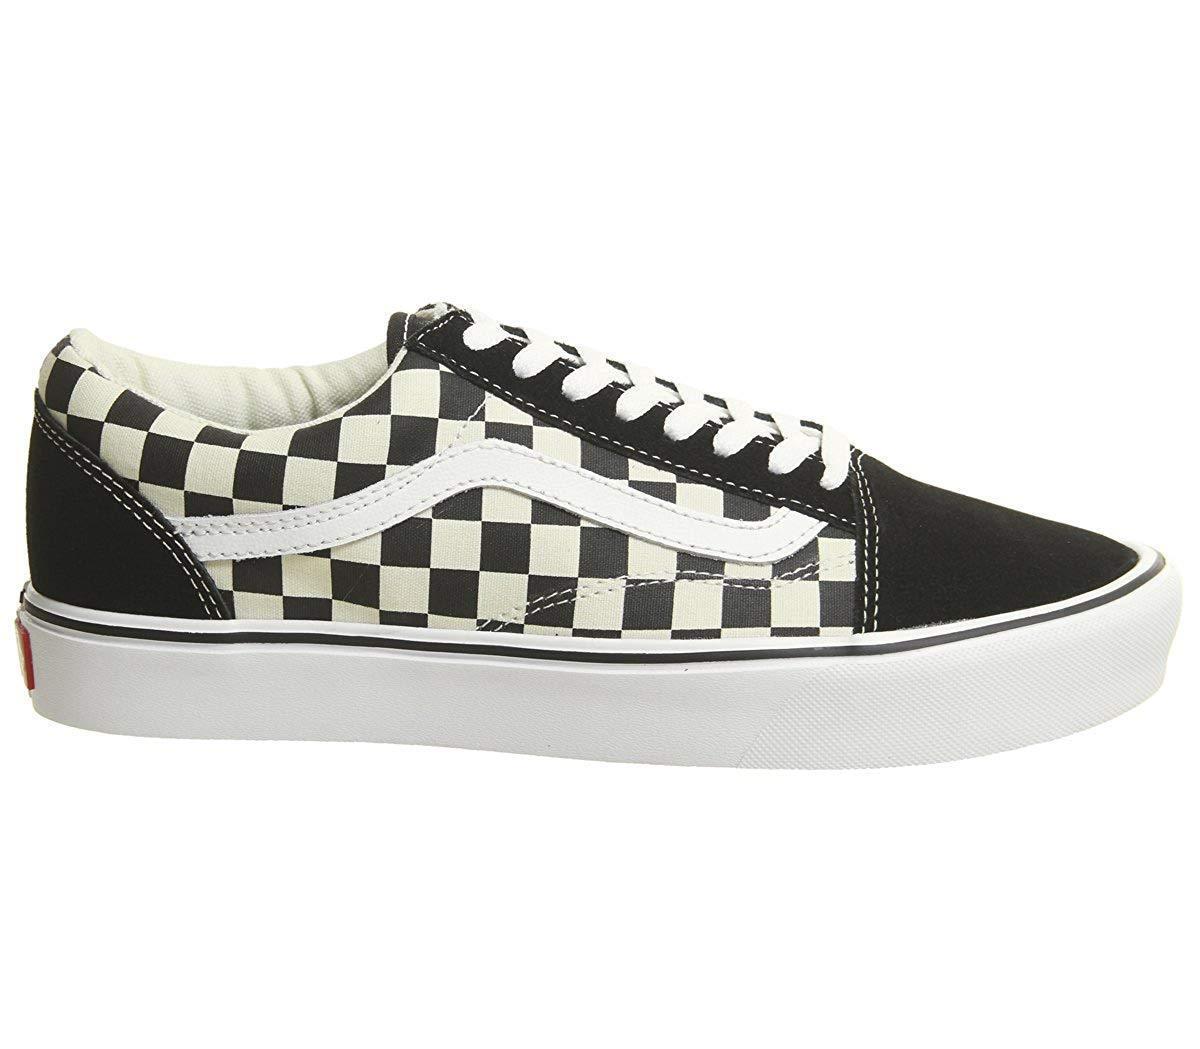 Vans Old Skool Lite (Checkerboard) Black White (VN0A275W5GX)